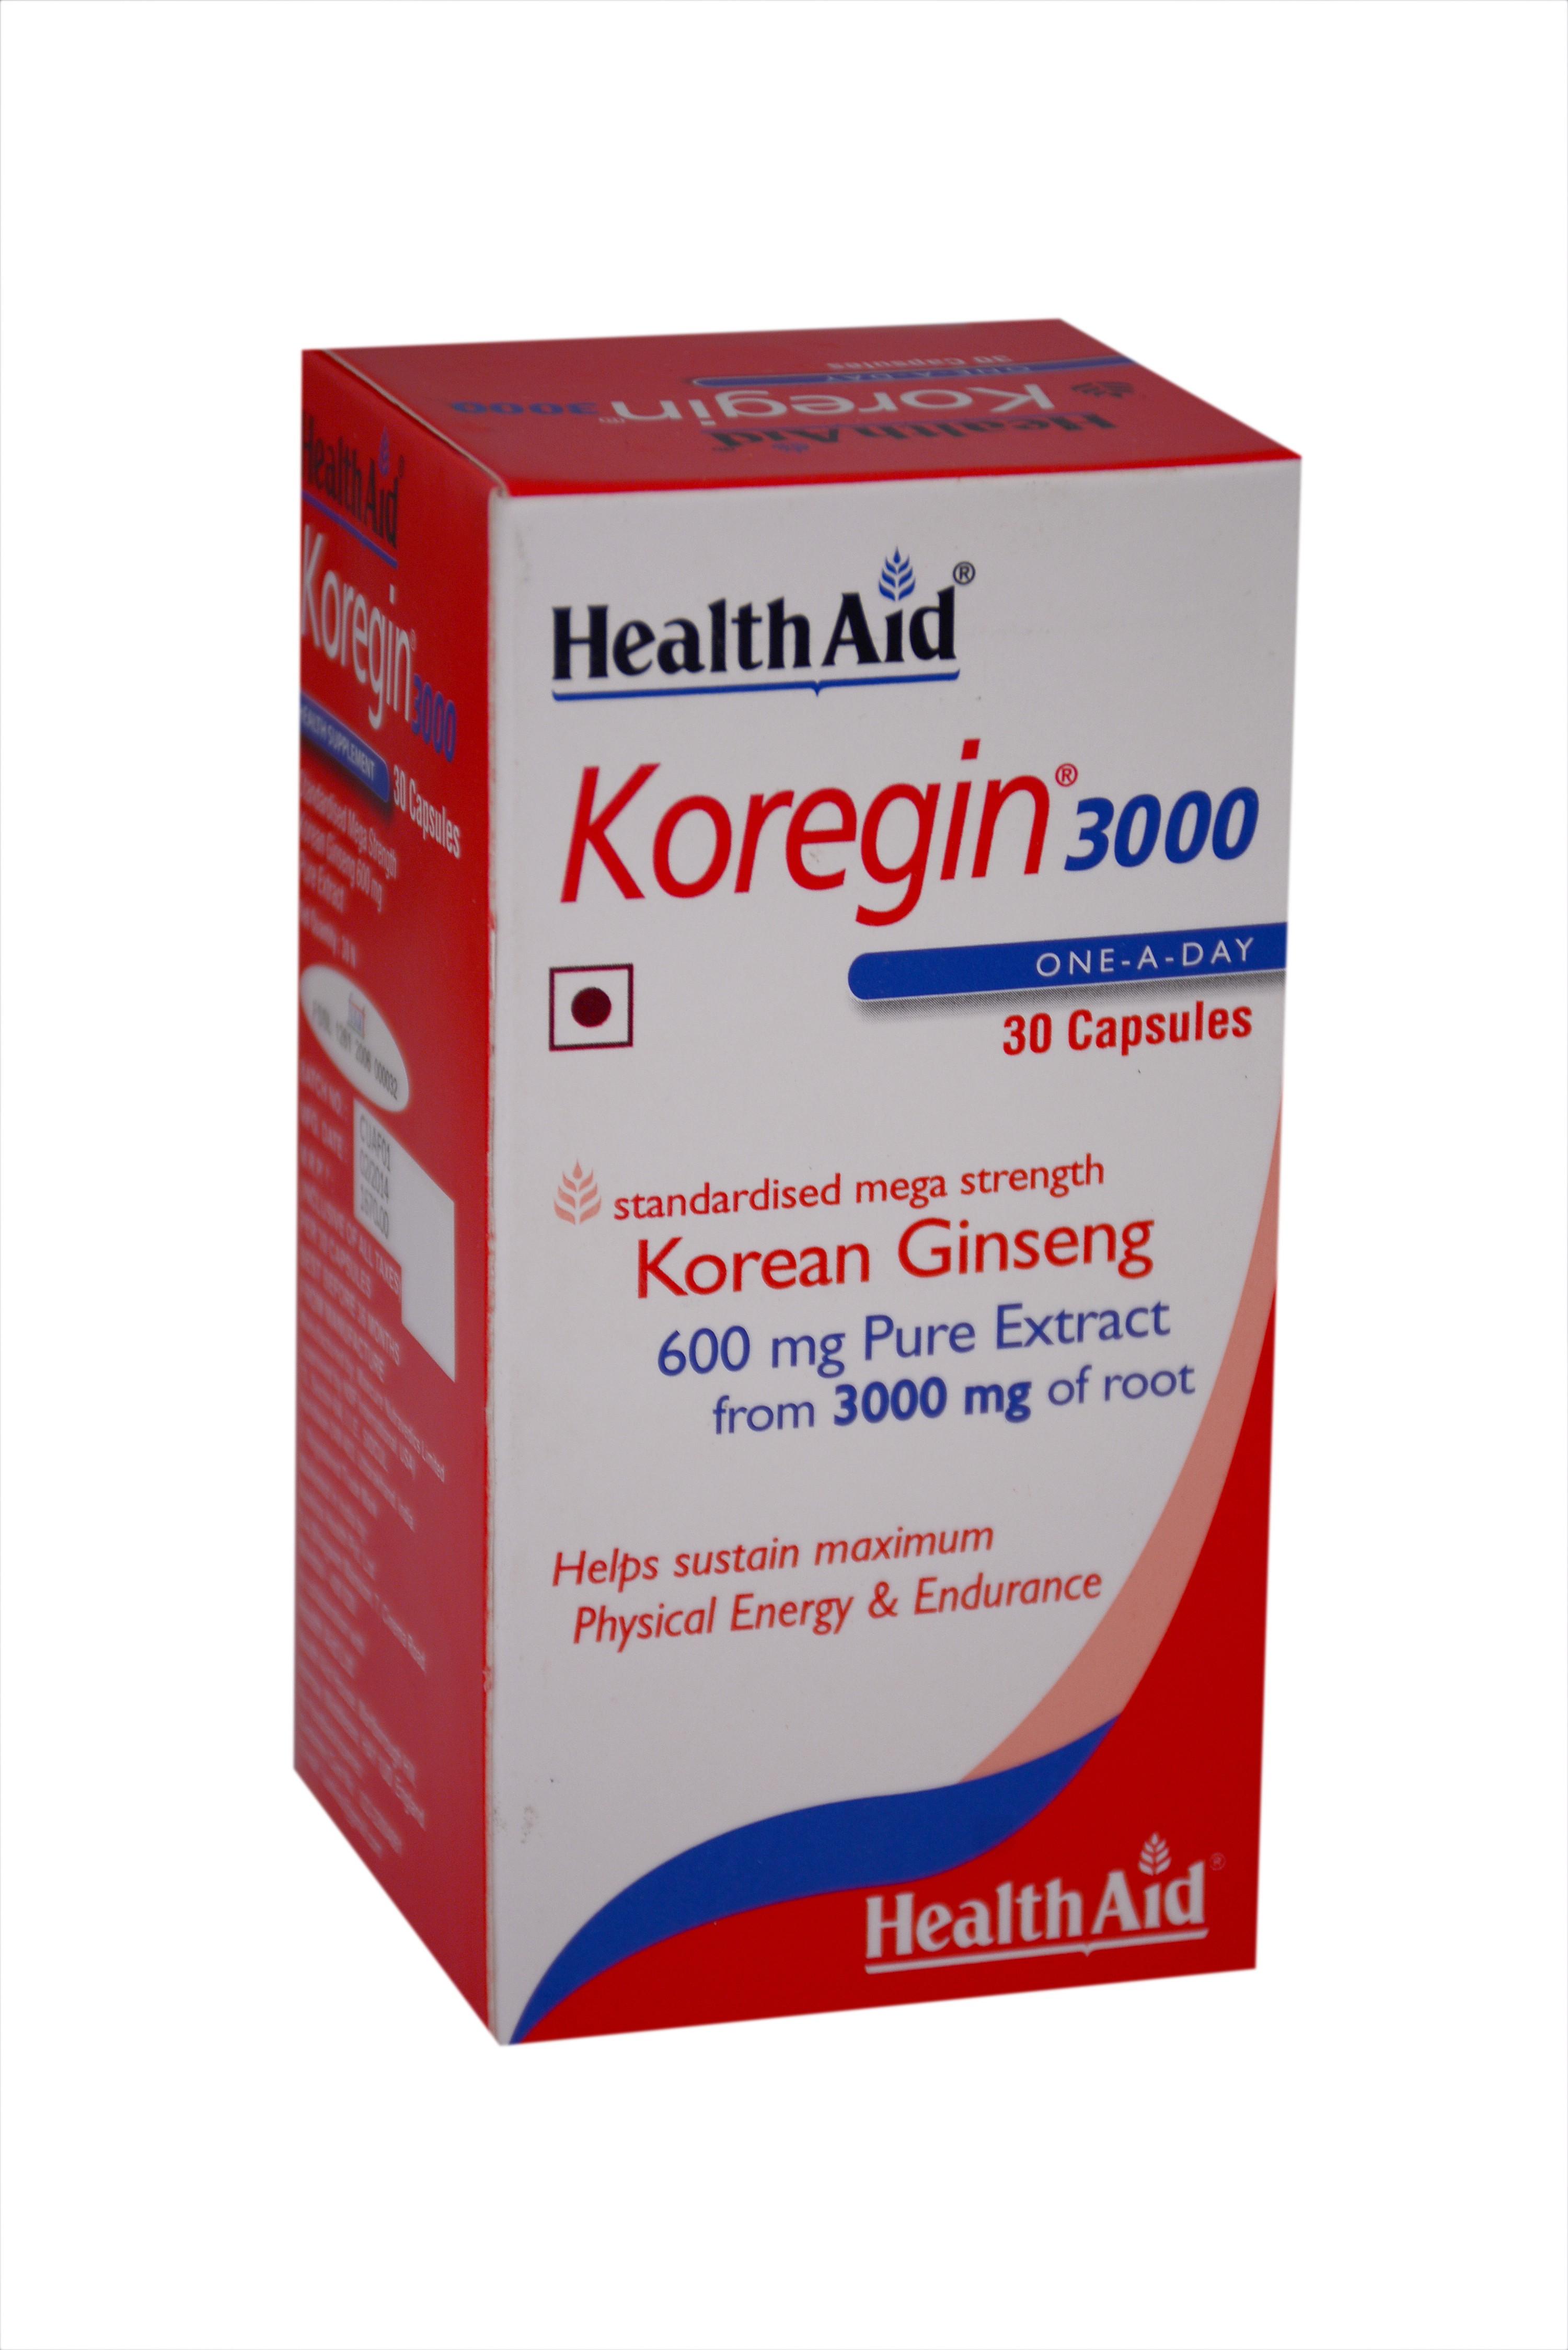 HealthAid Koregin 3000 (Korean Ginseng 600mg) Flipkart